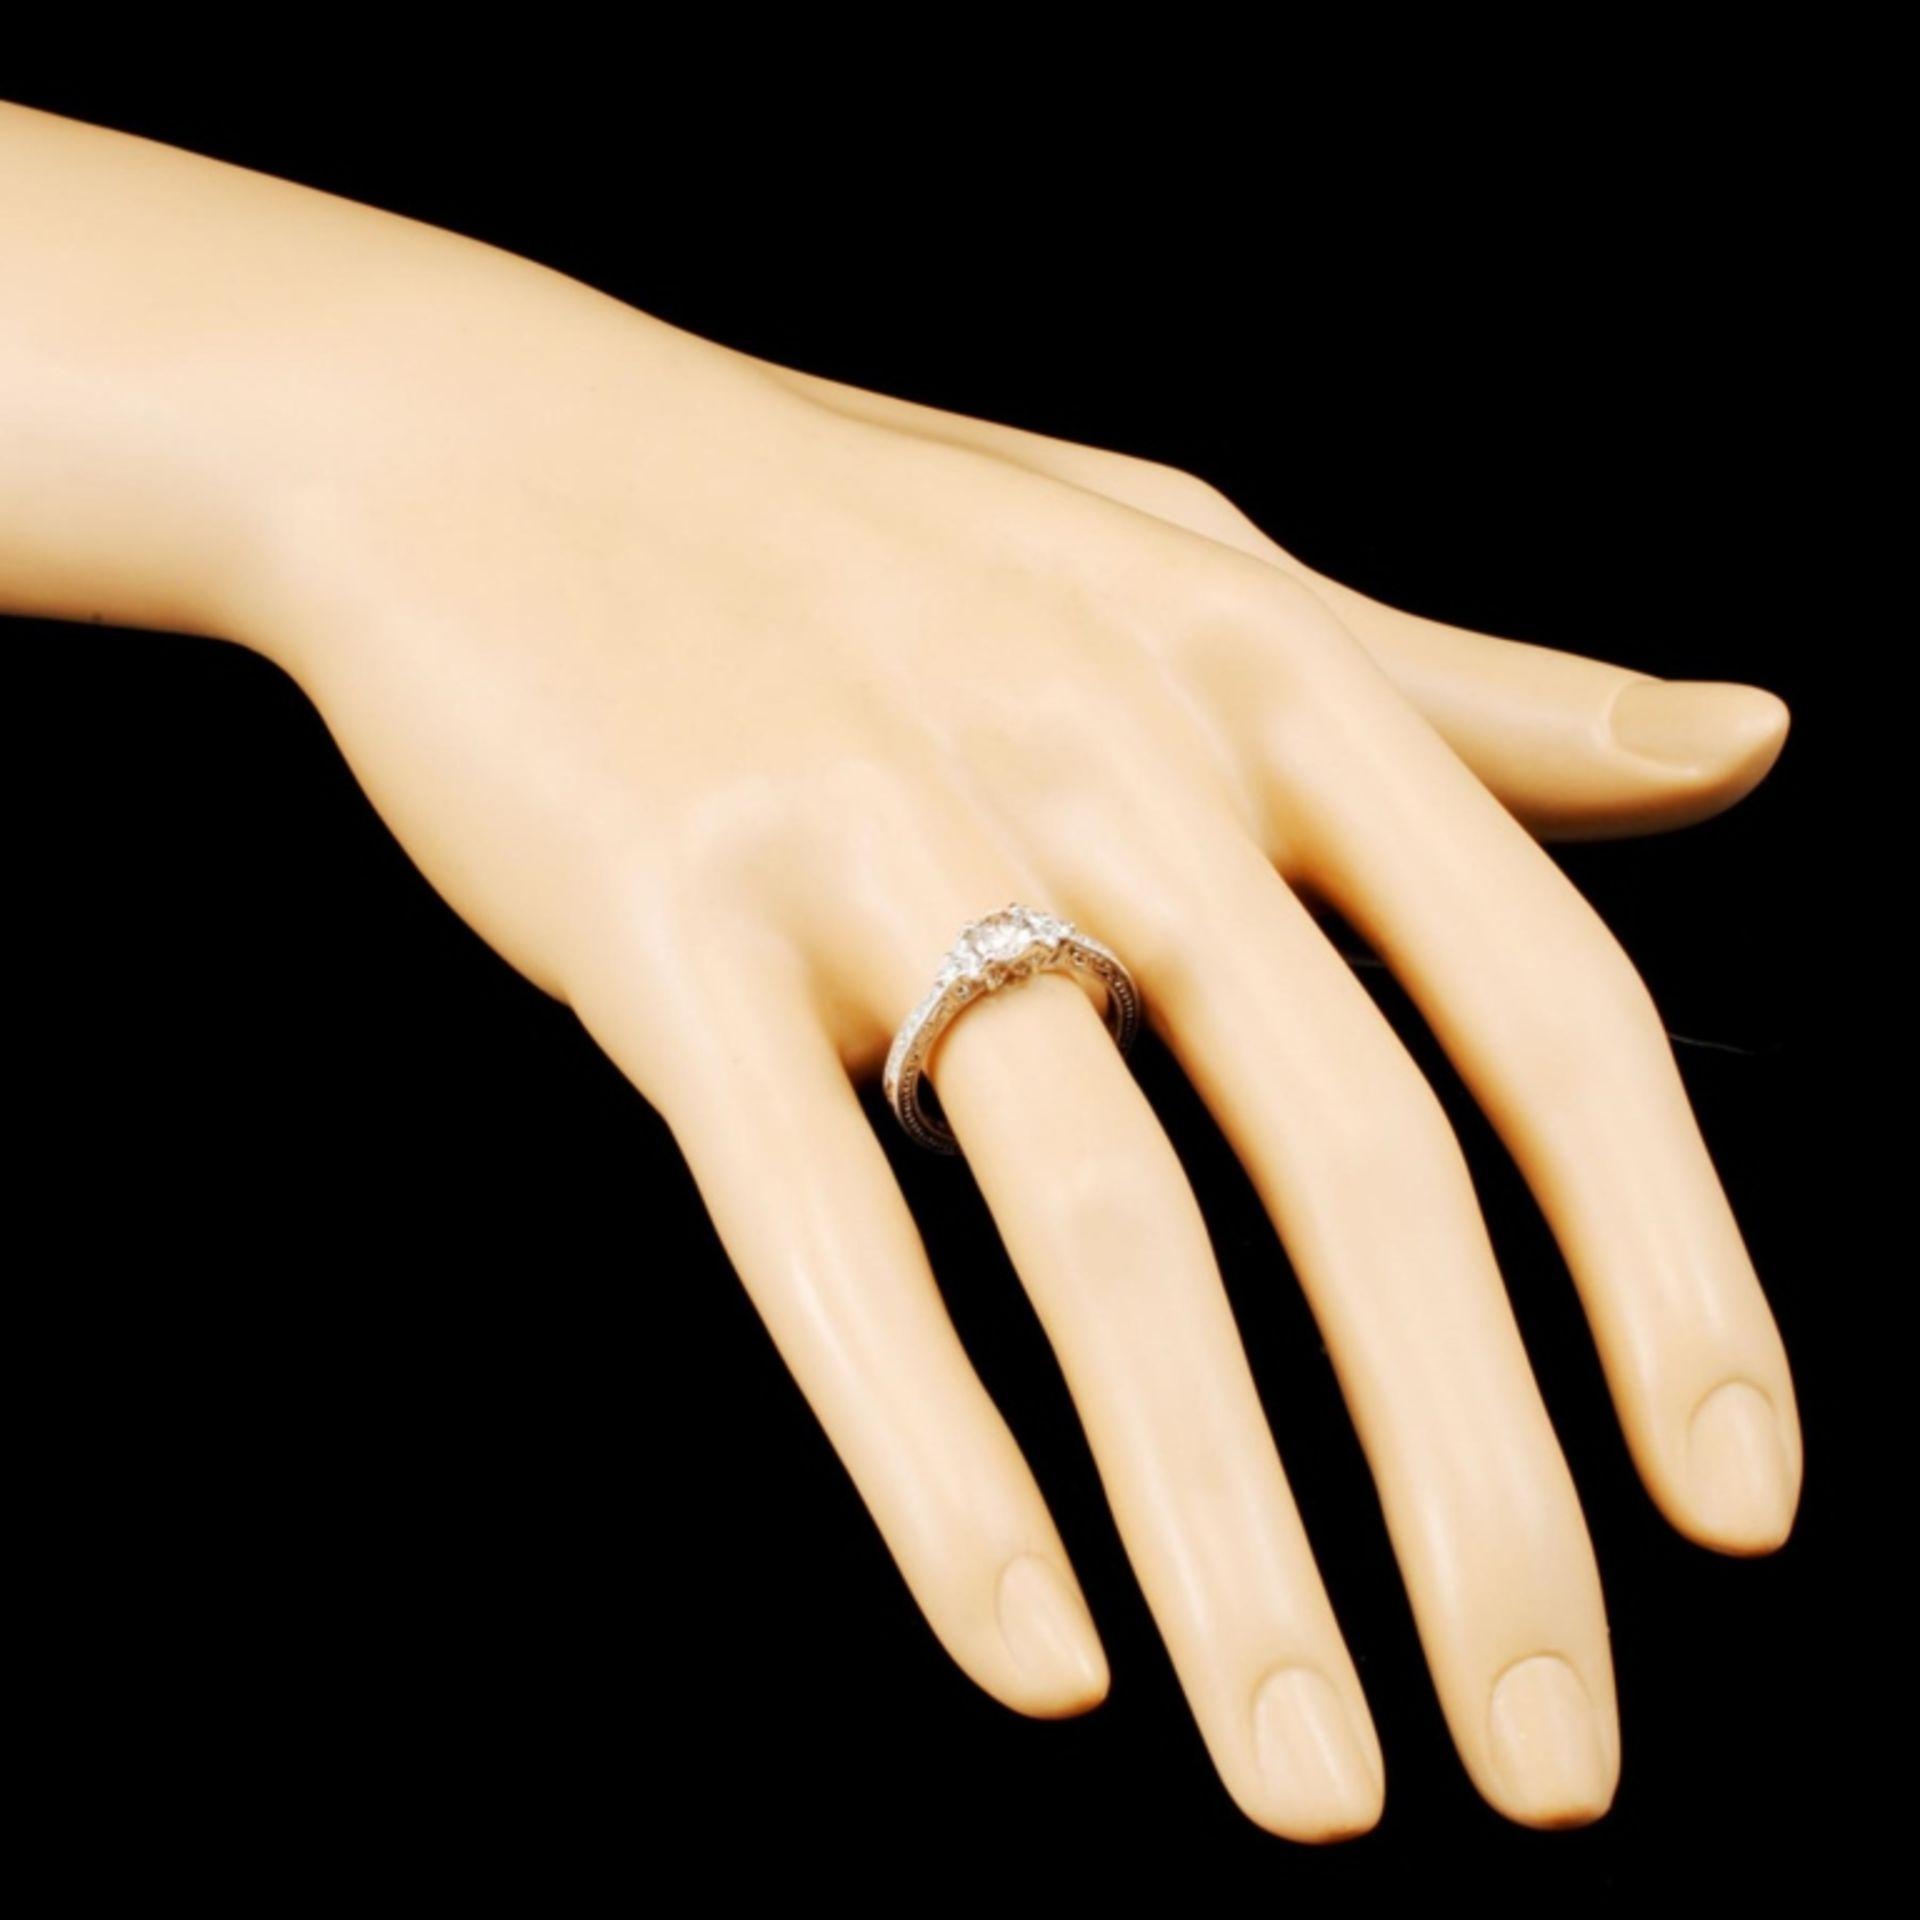 18K Gold 0.75ctw Diamond Ring - Image 3 of 5